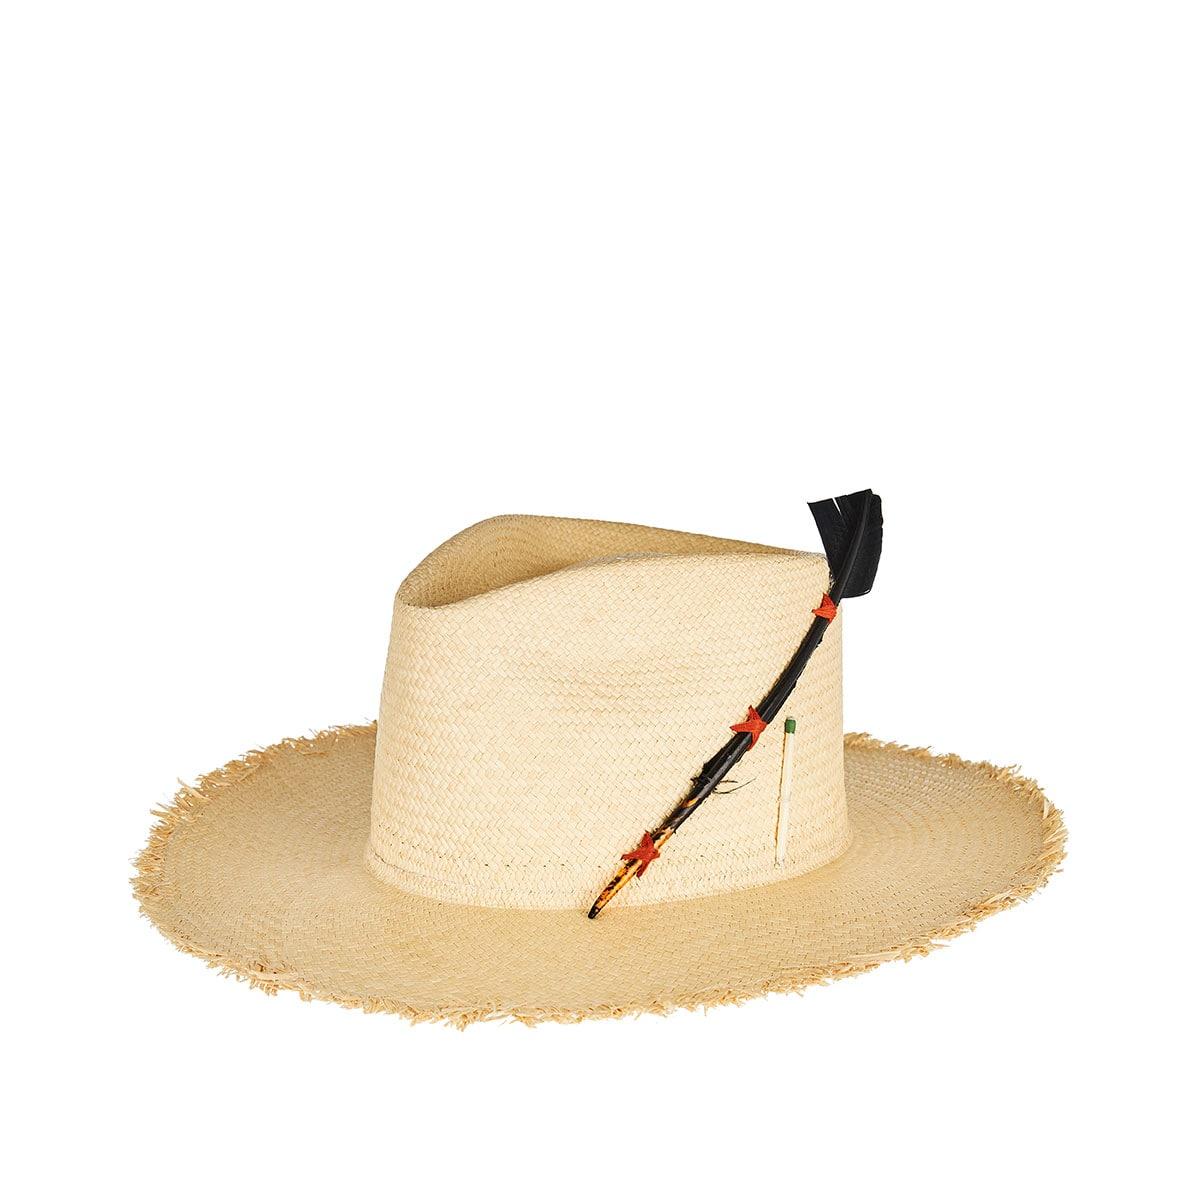 Black Bird woven straw hat